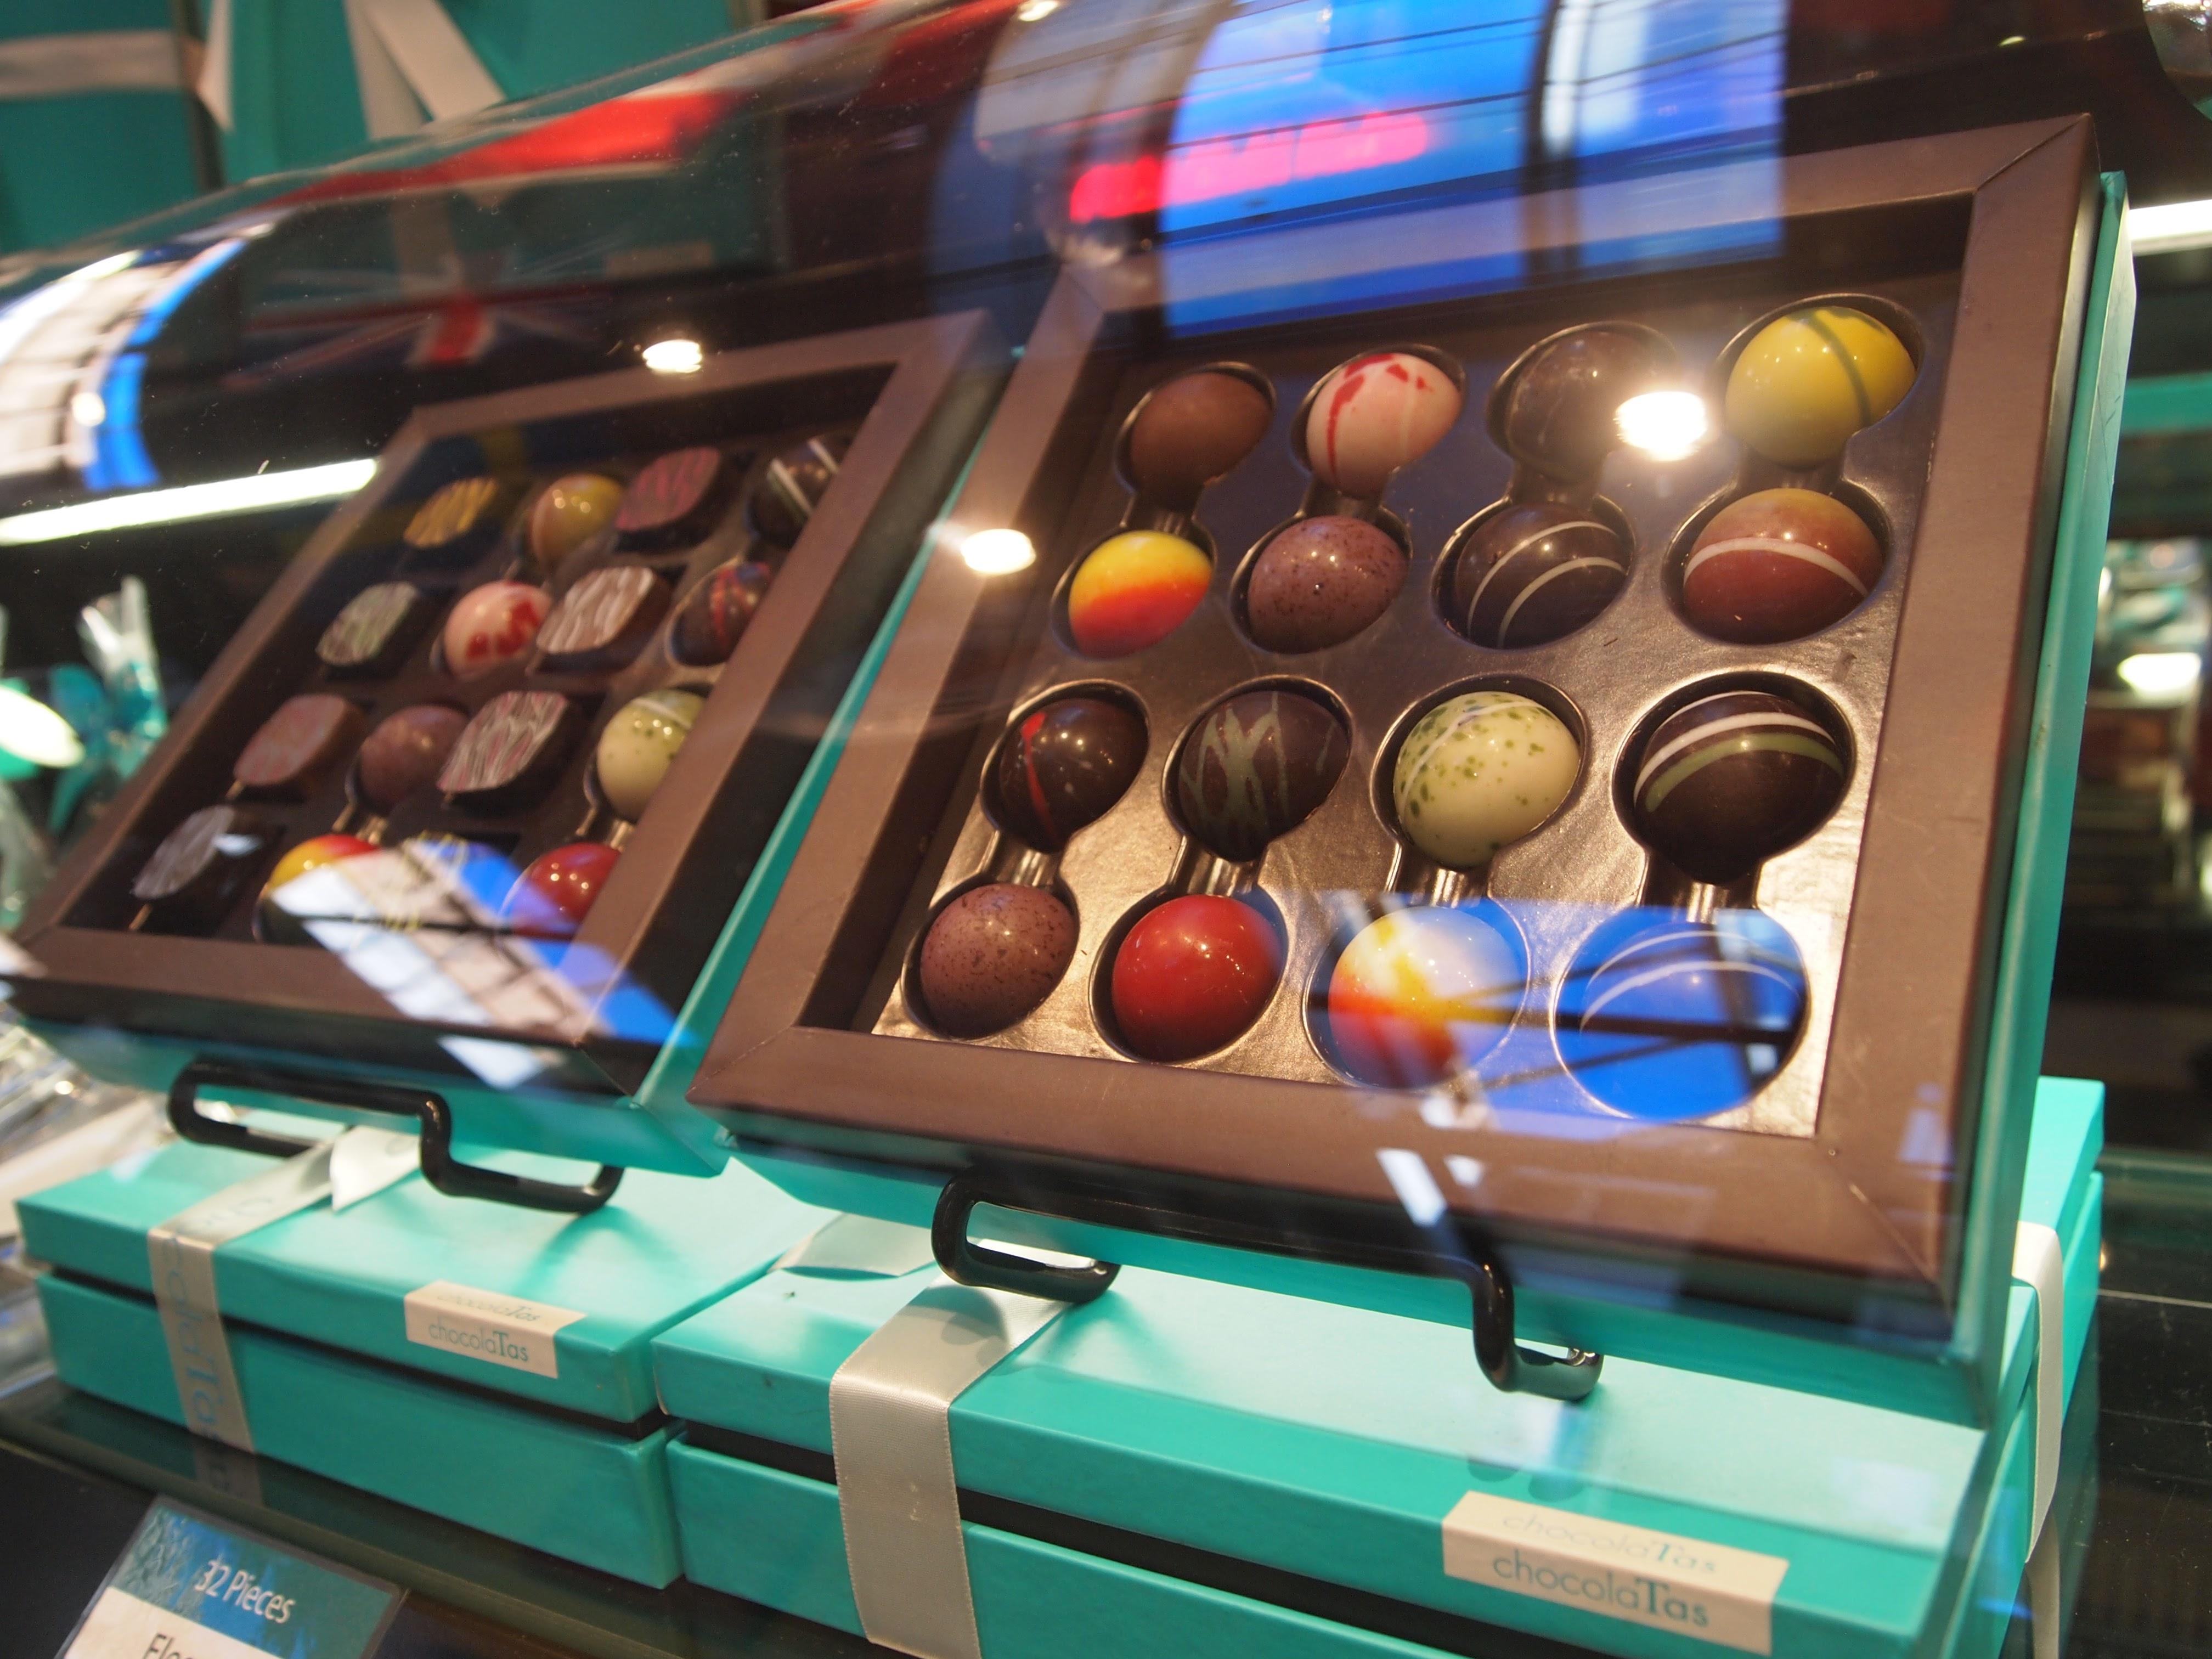 Chocolates too beautiful to eat from ChocolaTas